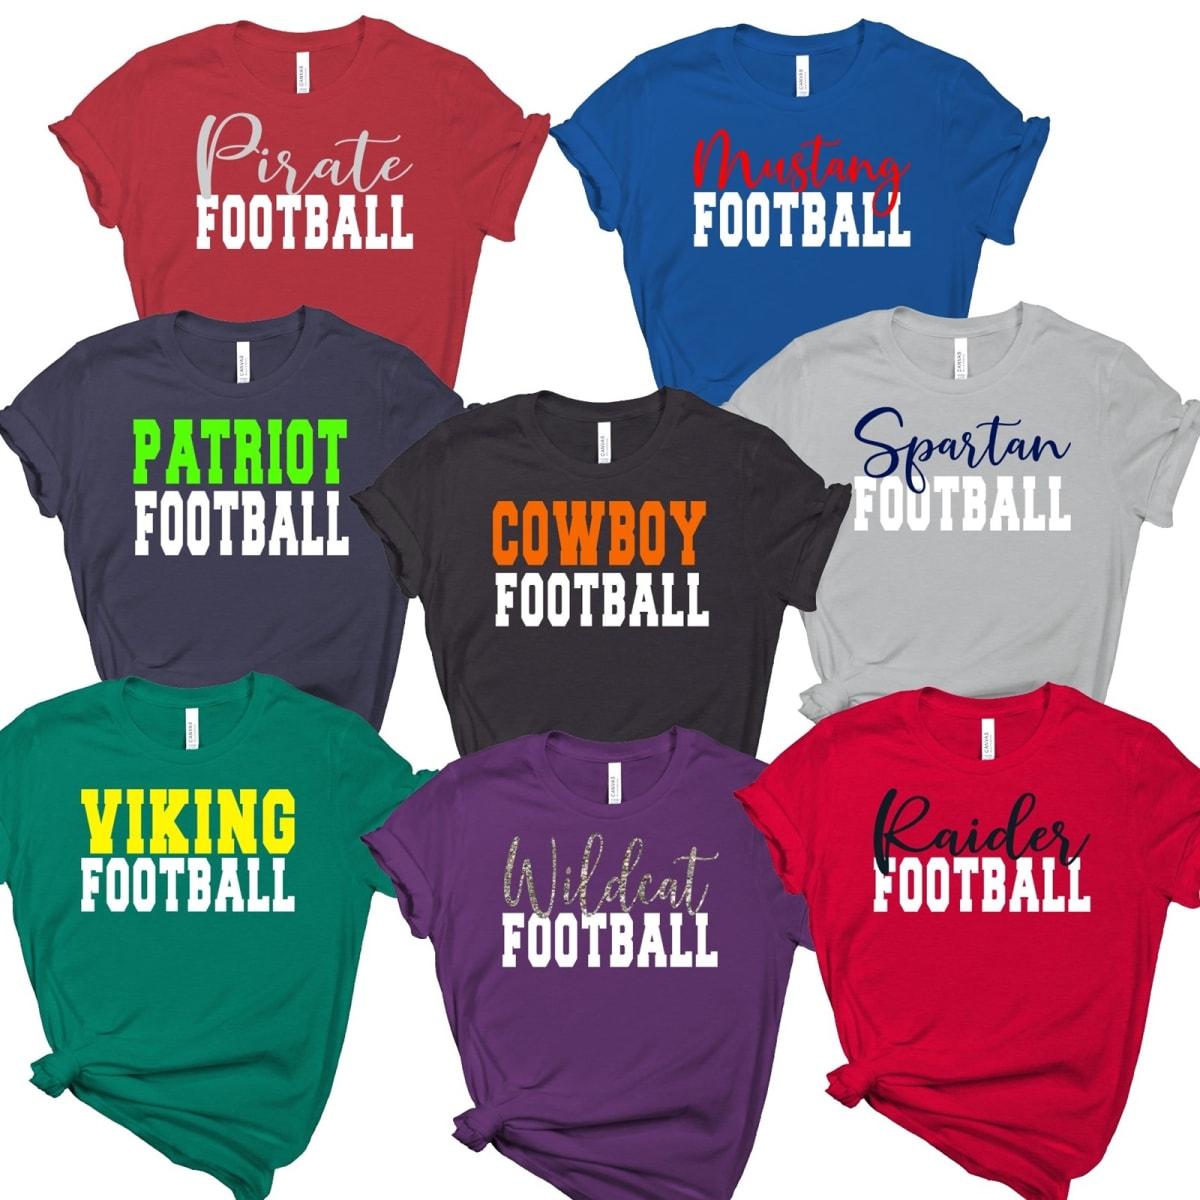 5707cad4ccb76 Personalized Football Team Shirts